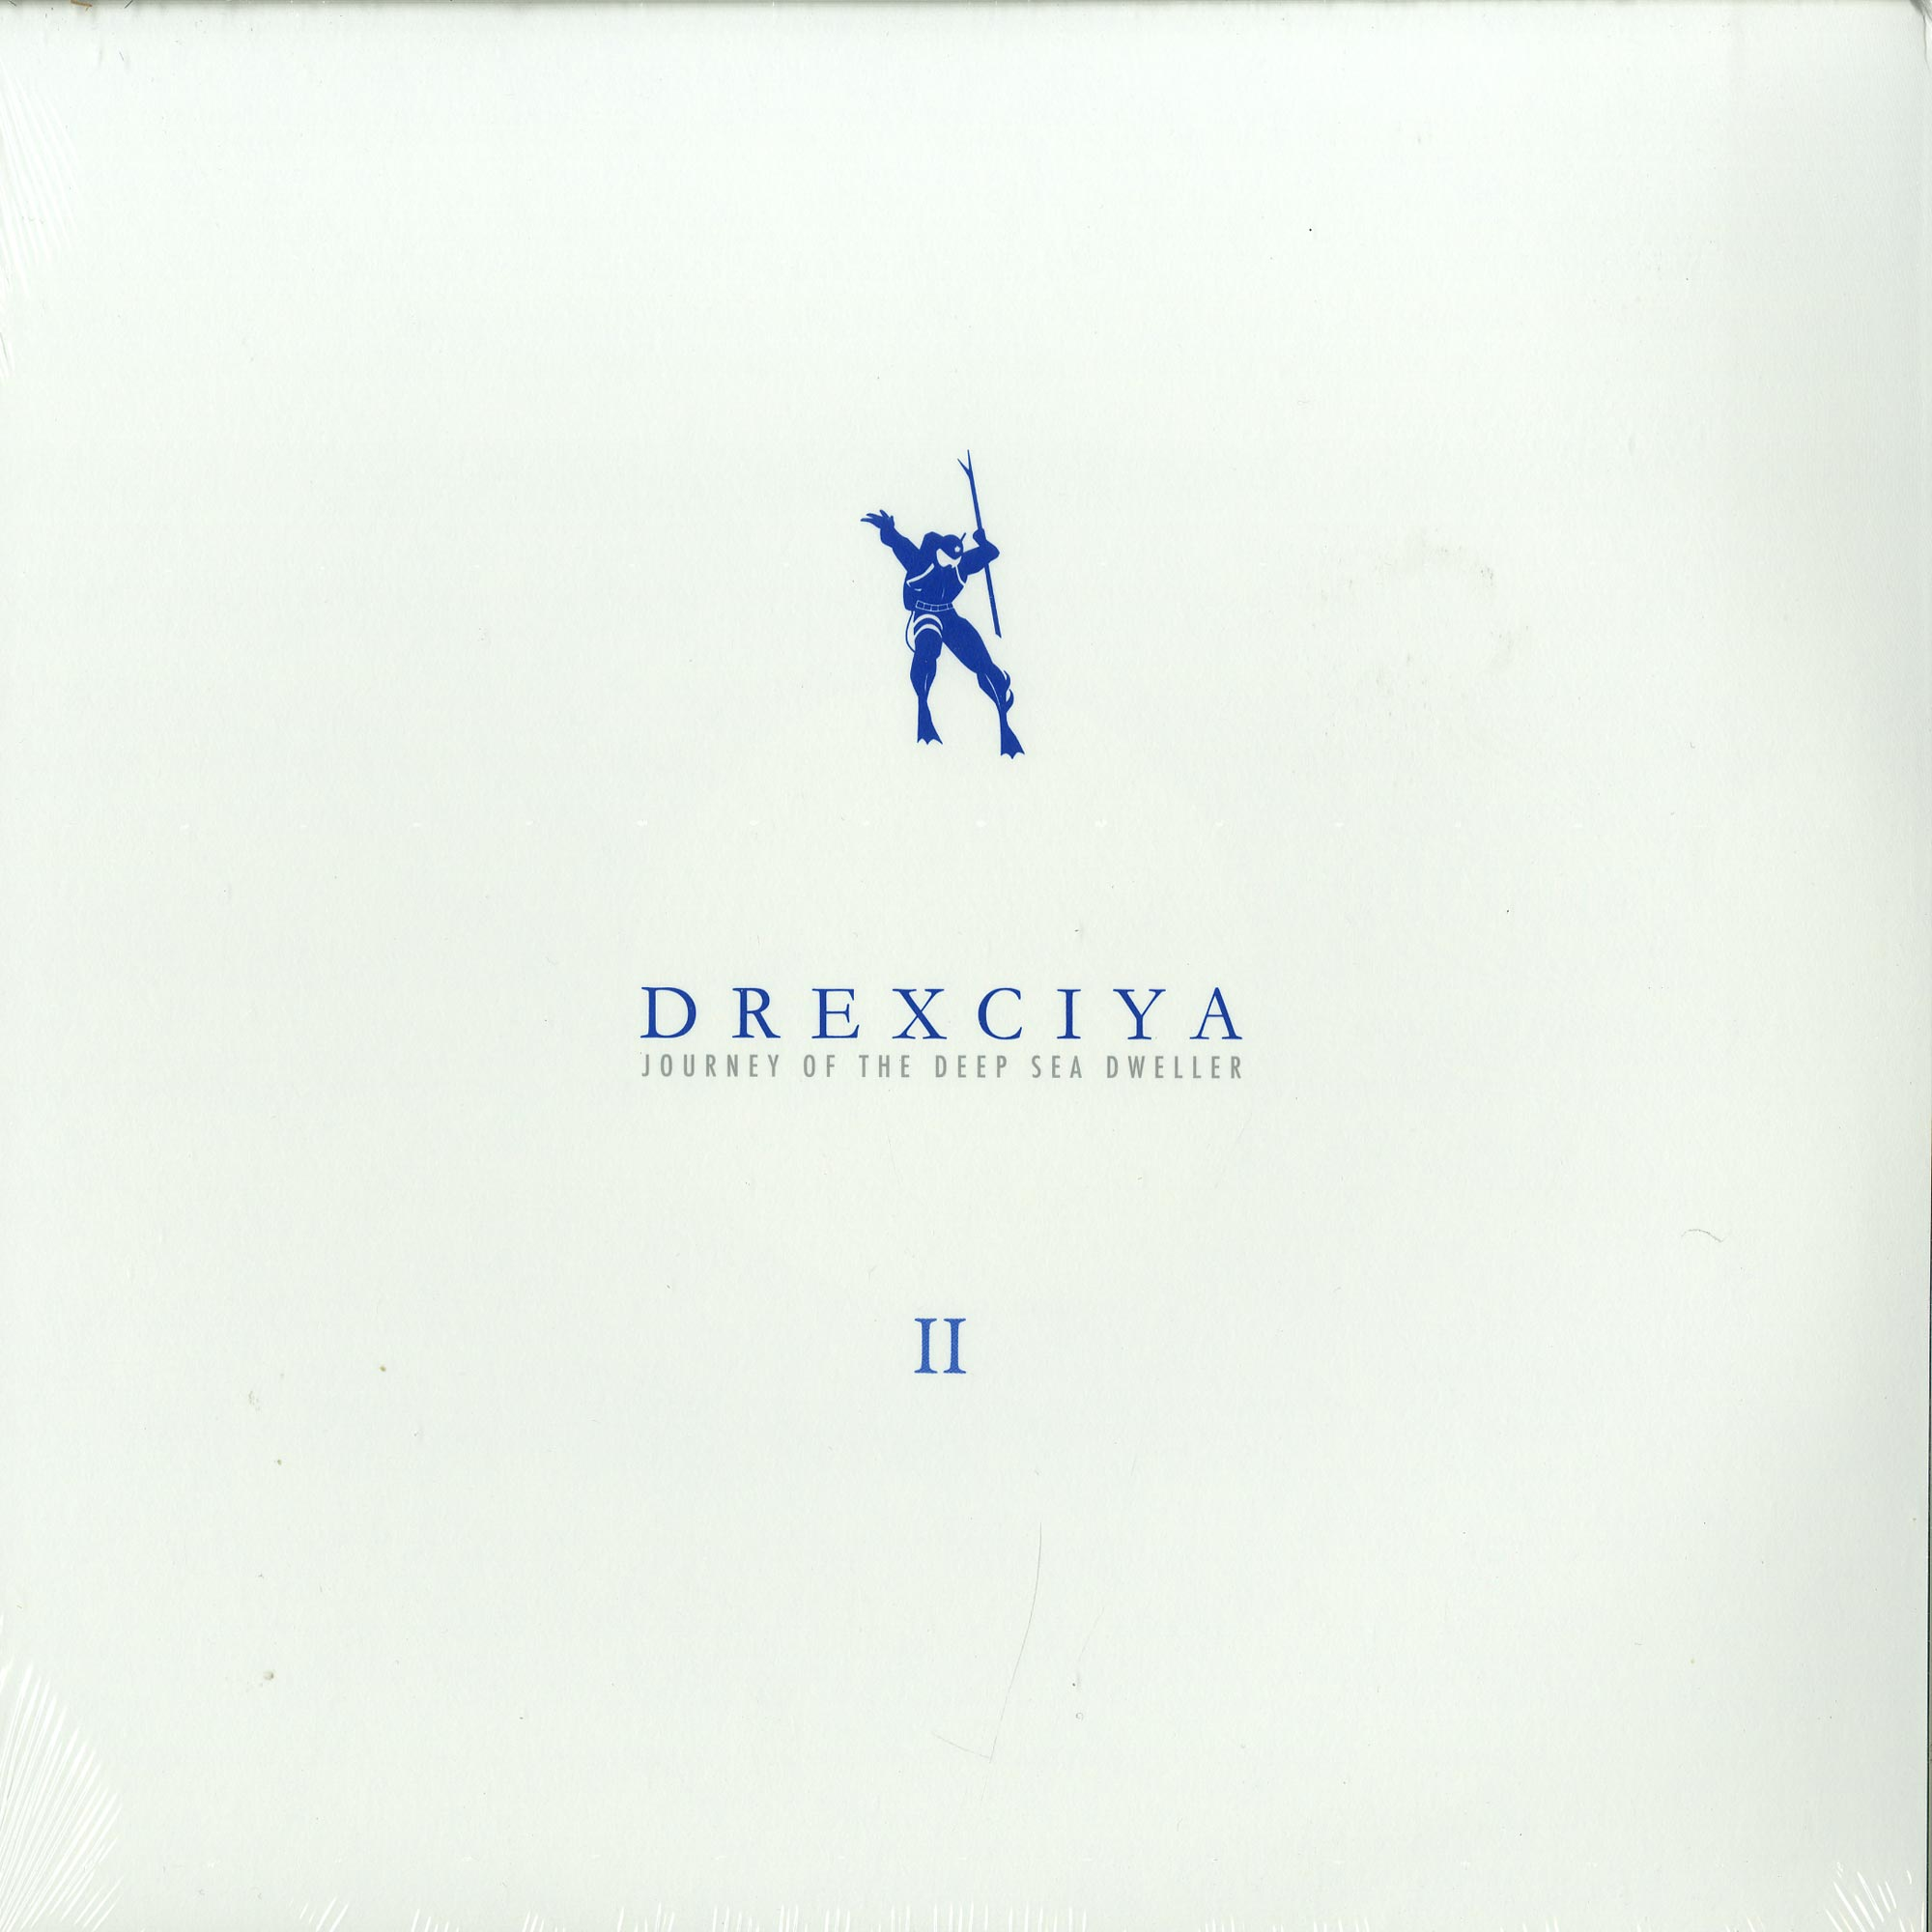 Drexciya - JOURNEY OF THE DEEP SEA DWELLER  - PART 2